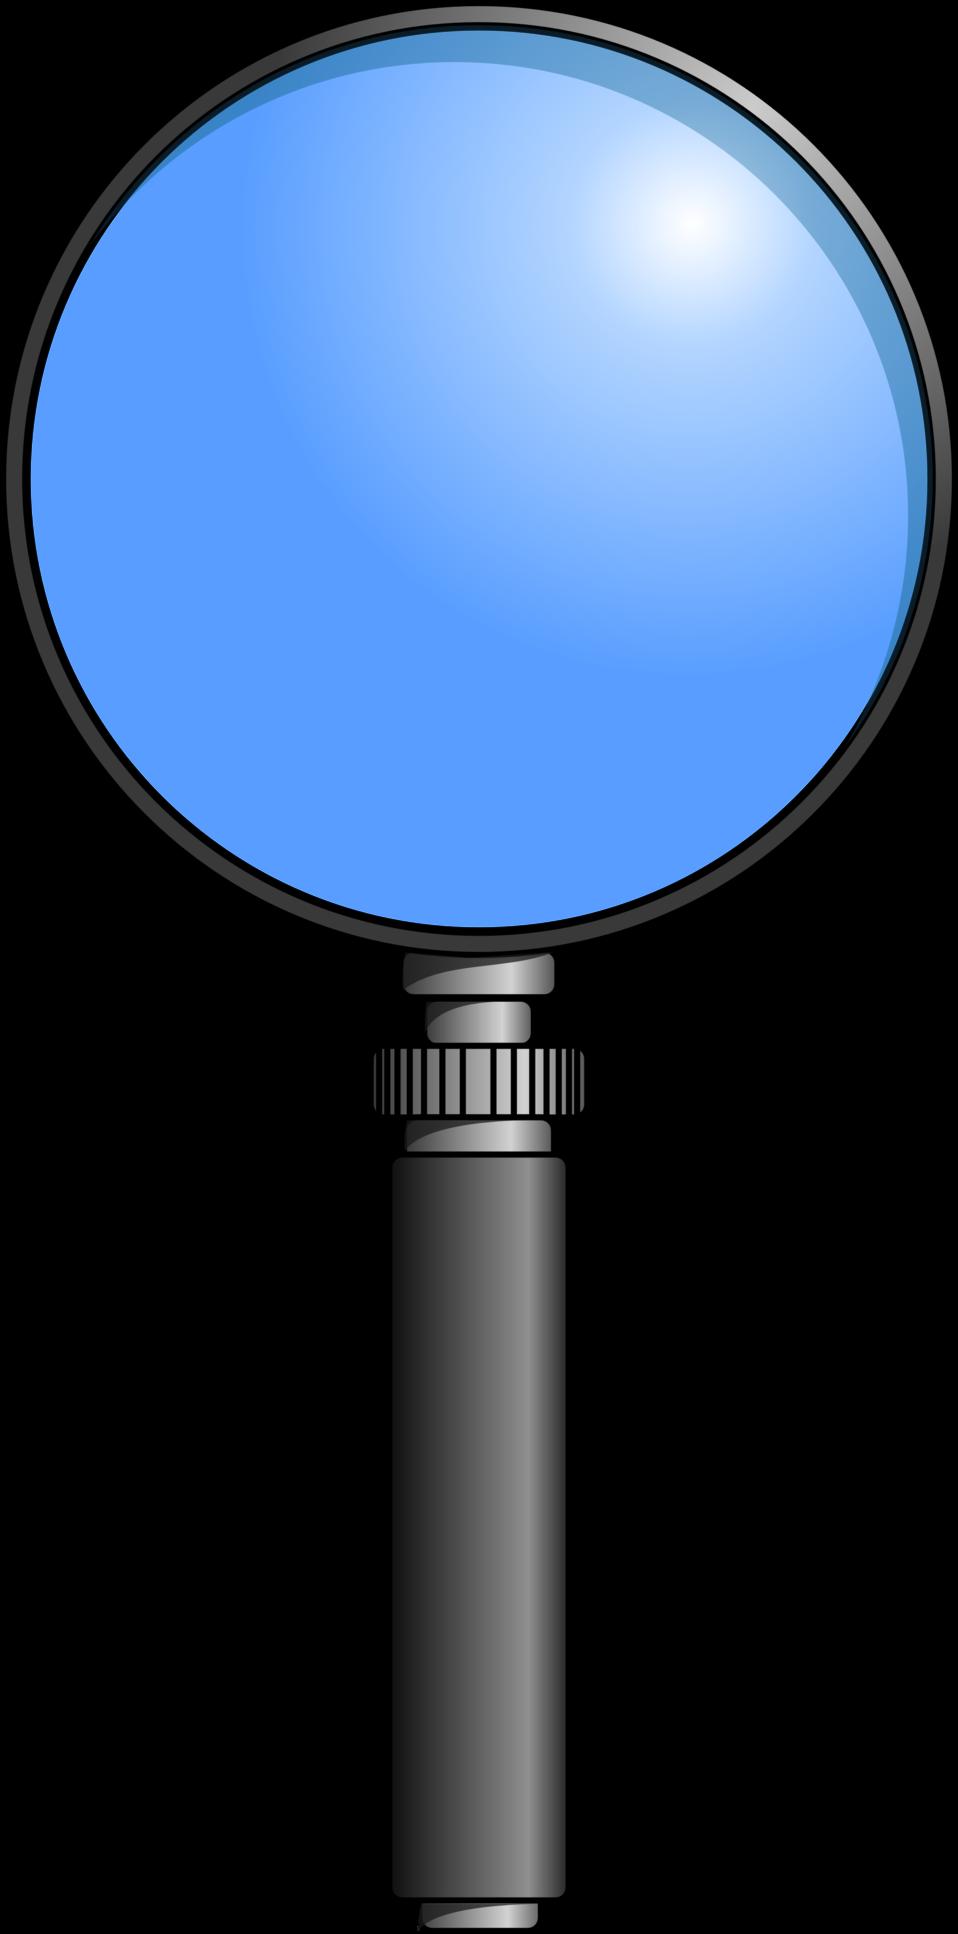 Public domain clip art. Person clipart magnifying glass